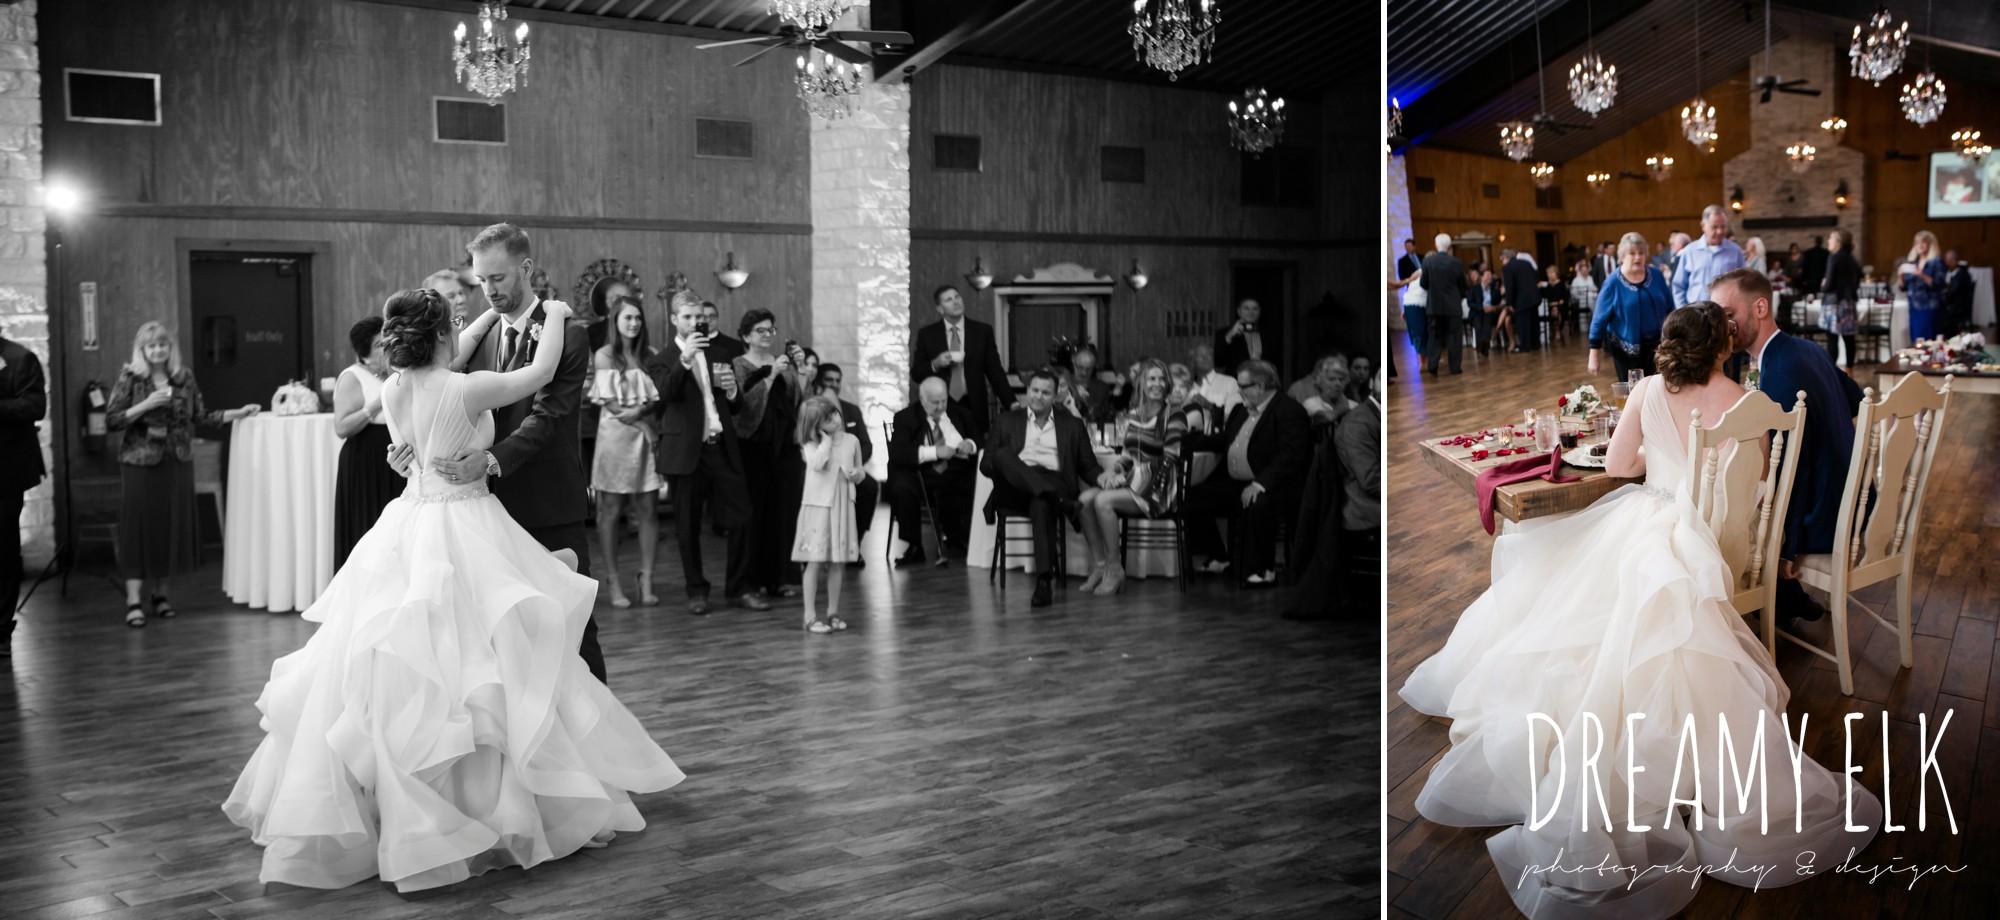 bride and groom first dance, fall wedding, gold and navy wedding photo, ashelynn manor, austin texas wedding photographer, dreamy elk photography and design, emily ross